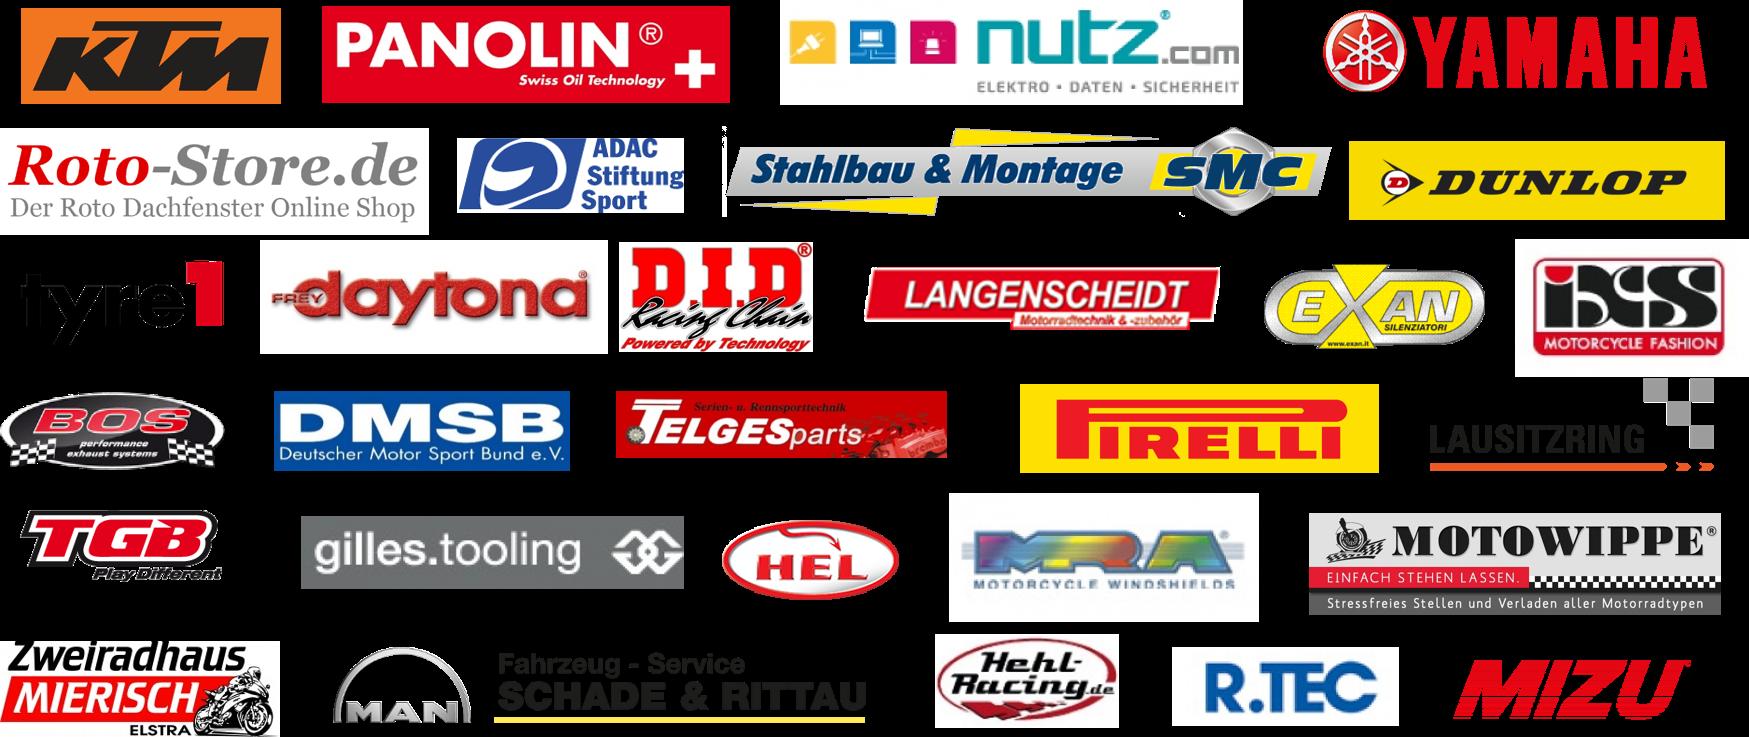 CEV Logos